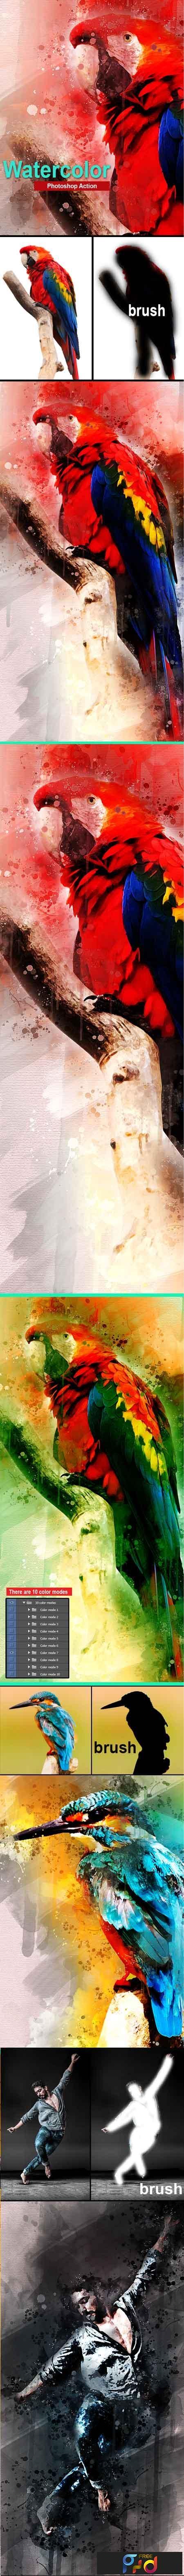 Amazing Watercolor Photoshop Action 23161516 1